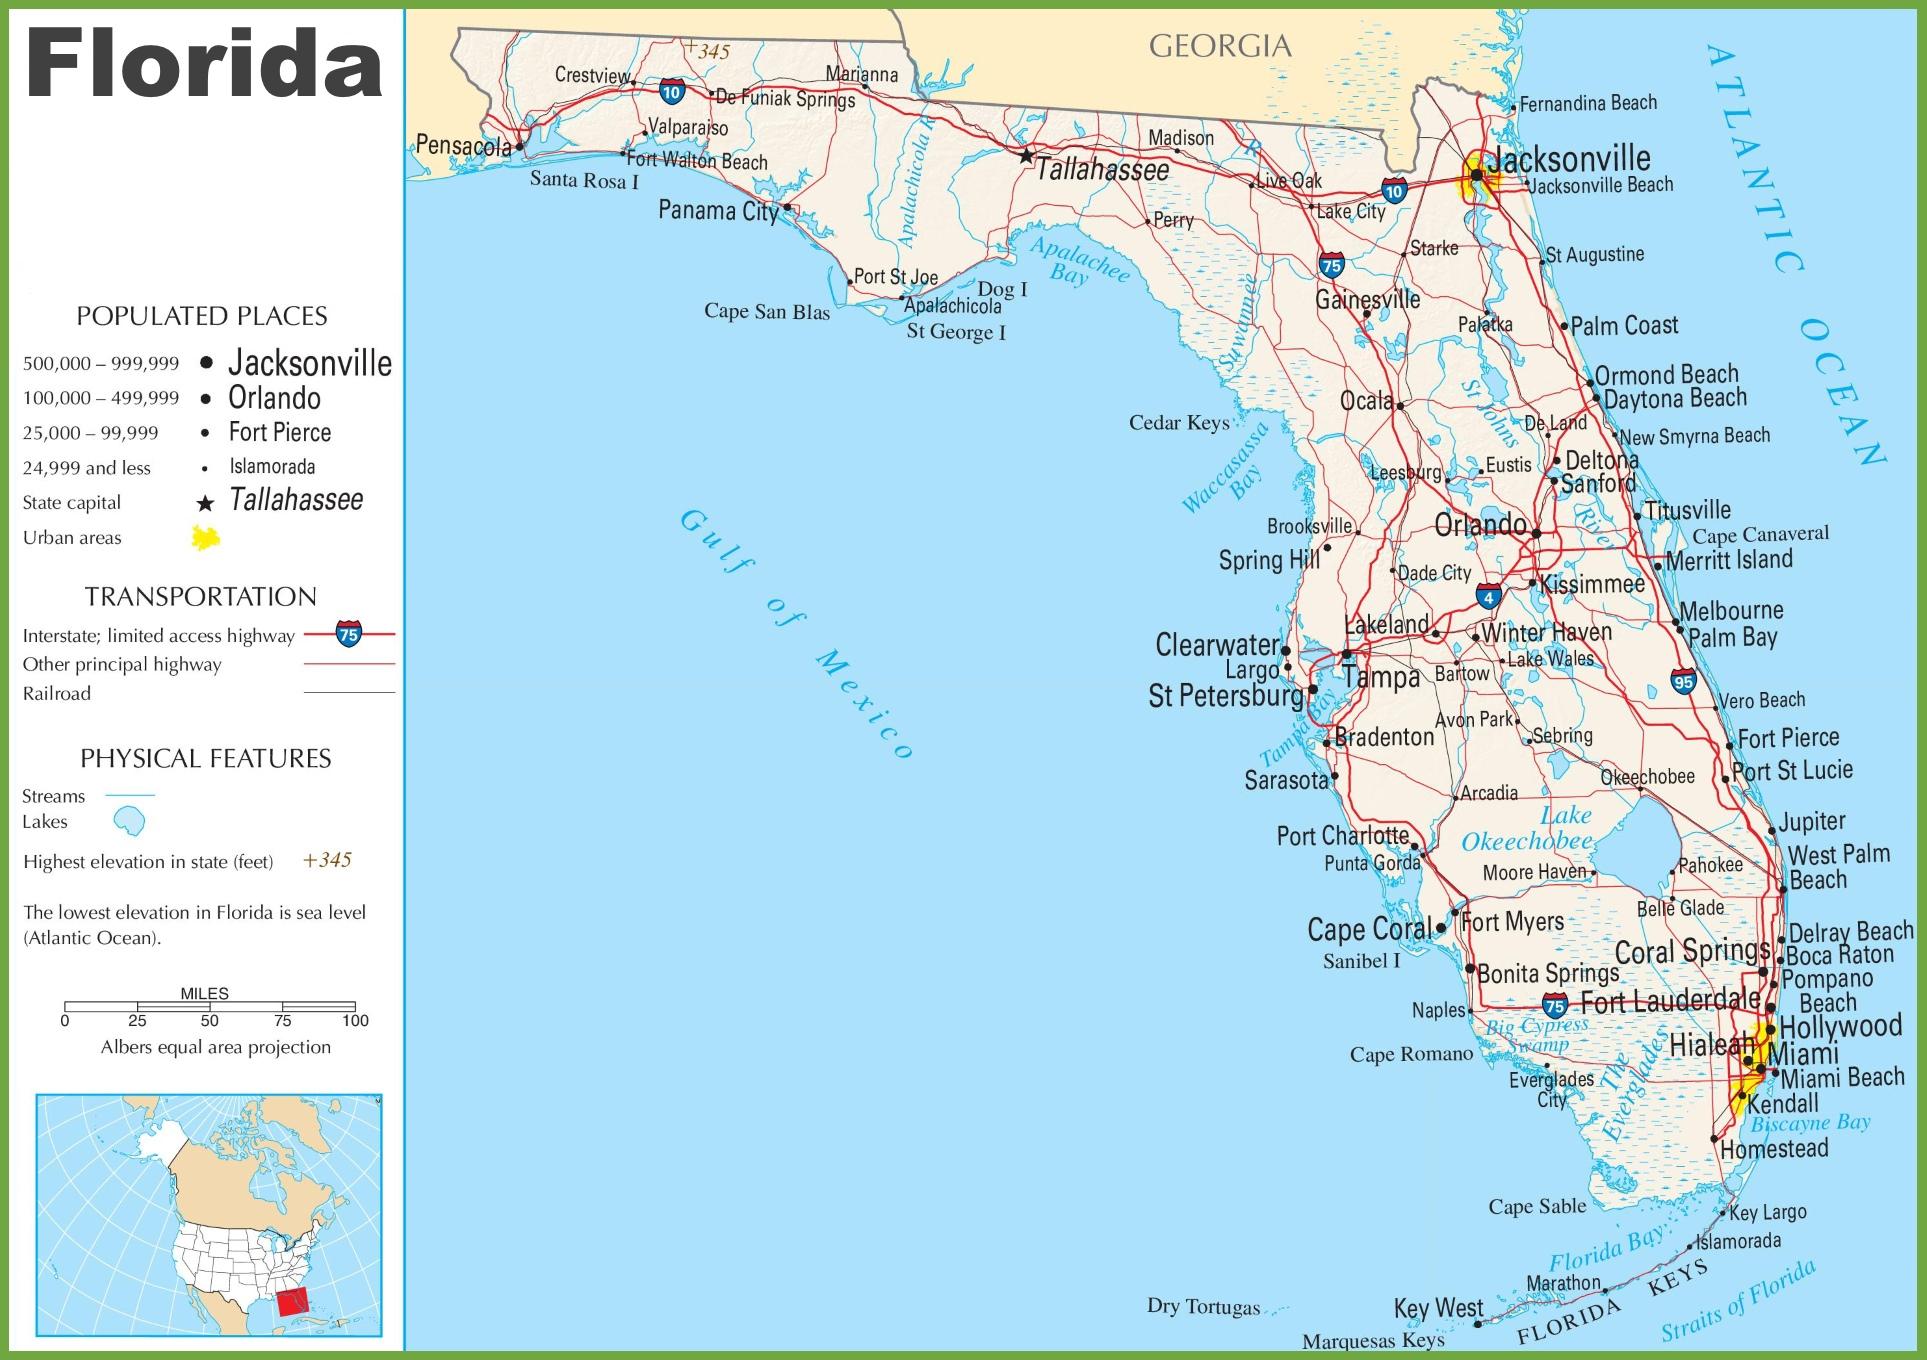 Florida State Maps | Usa | Maps Of Florida (Fl) - Highway Map Of South Florida